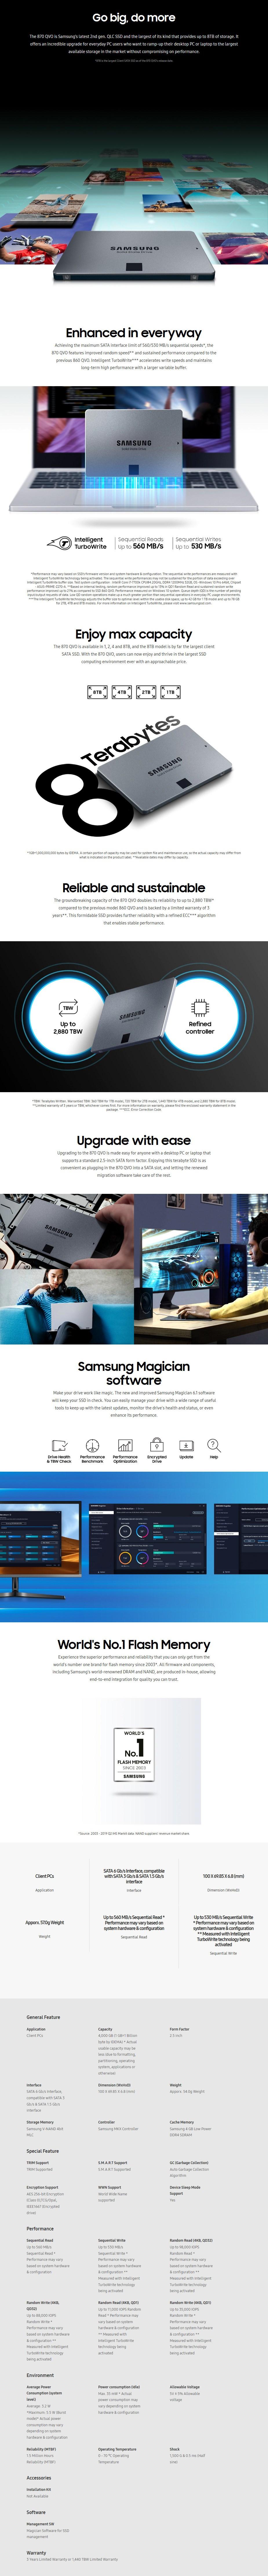 Samsung 870 QVO 4TB 2.5: SATA III 6GB/s 4-Bit MLC V-NAND SSD MZ-77Q4T0BW - Overview 1